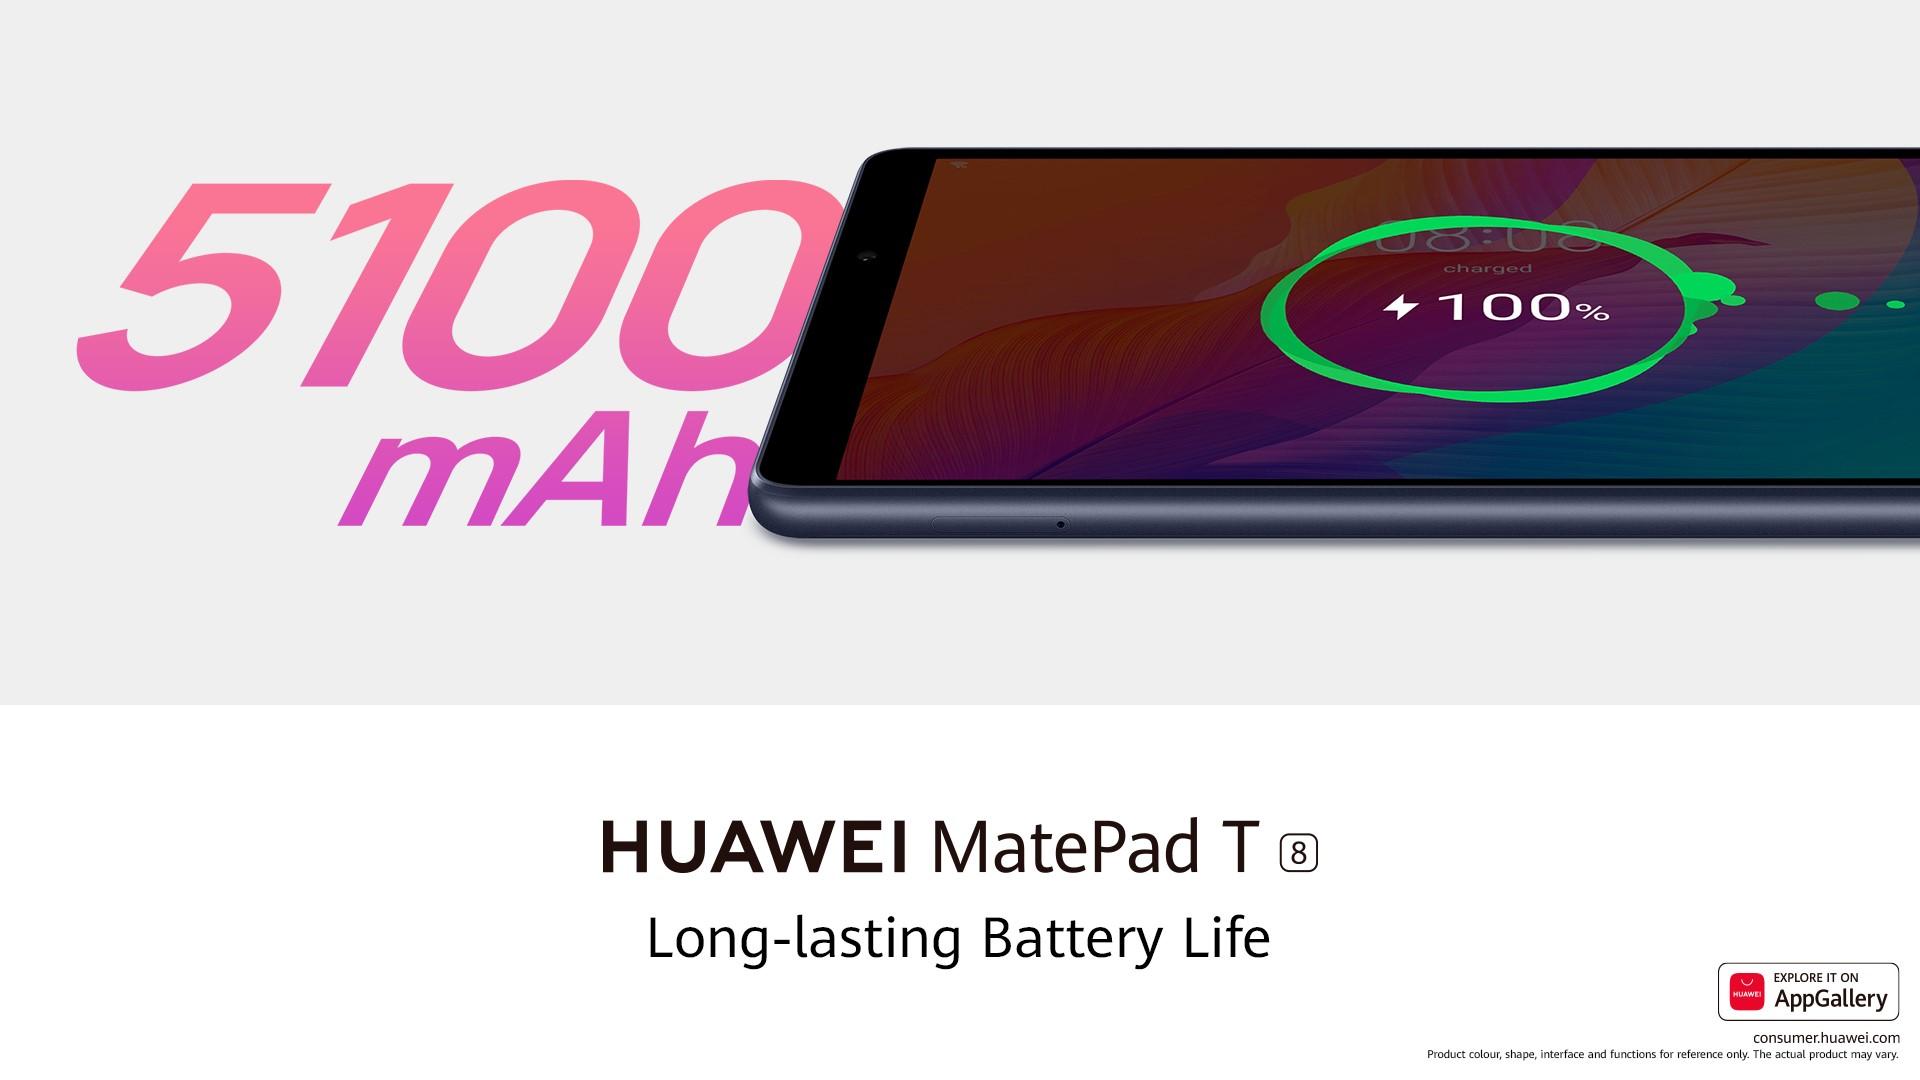 Huawei MatePad T8: رفيقك الأمثل لأداء مهامك على مدار اليوم